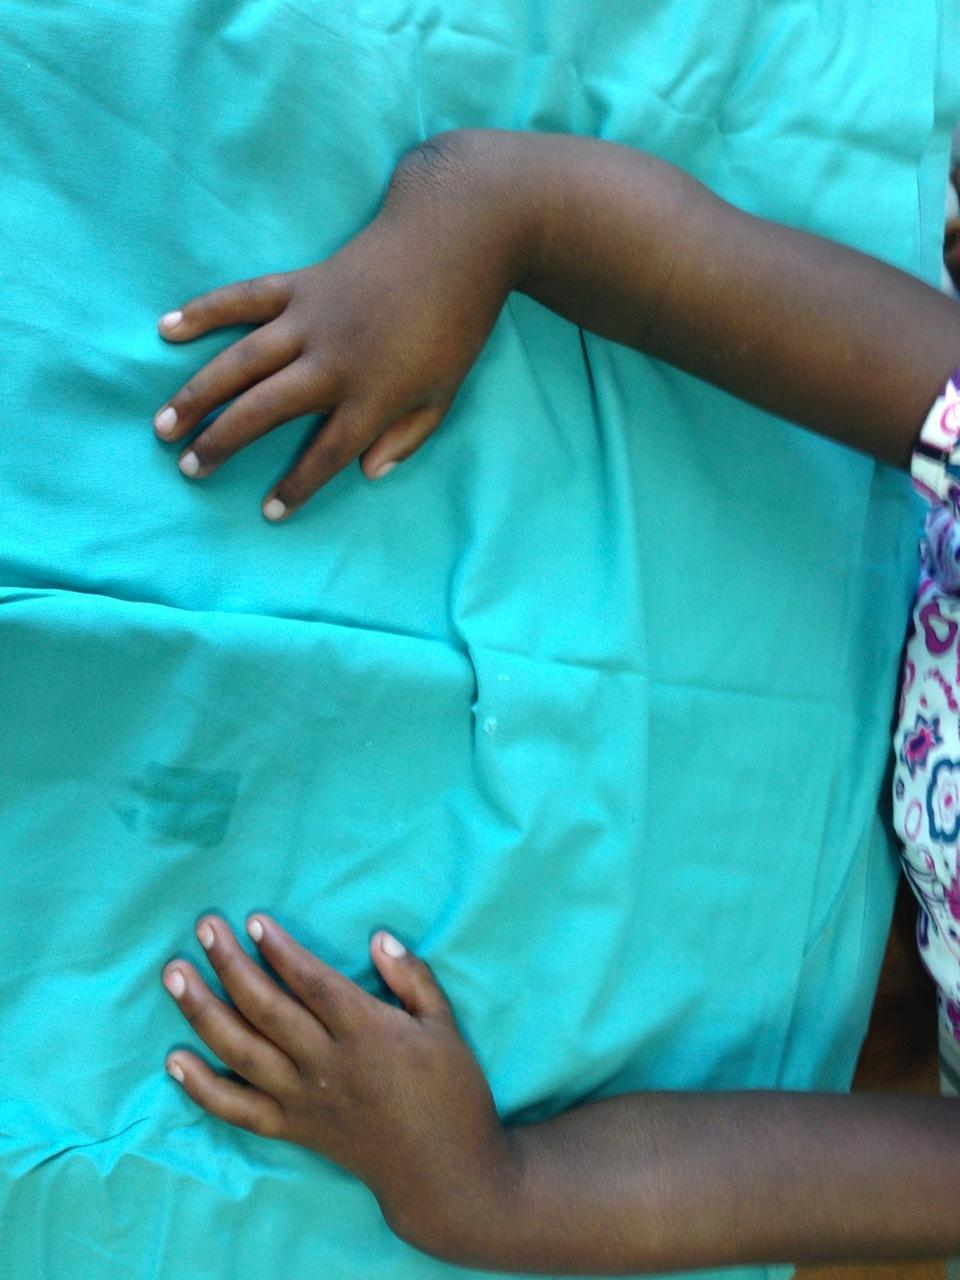 Congenital Hand Anomalies Surgery  U0026 Treatment Cape Town